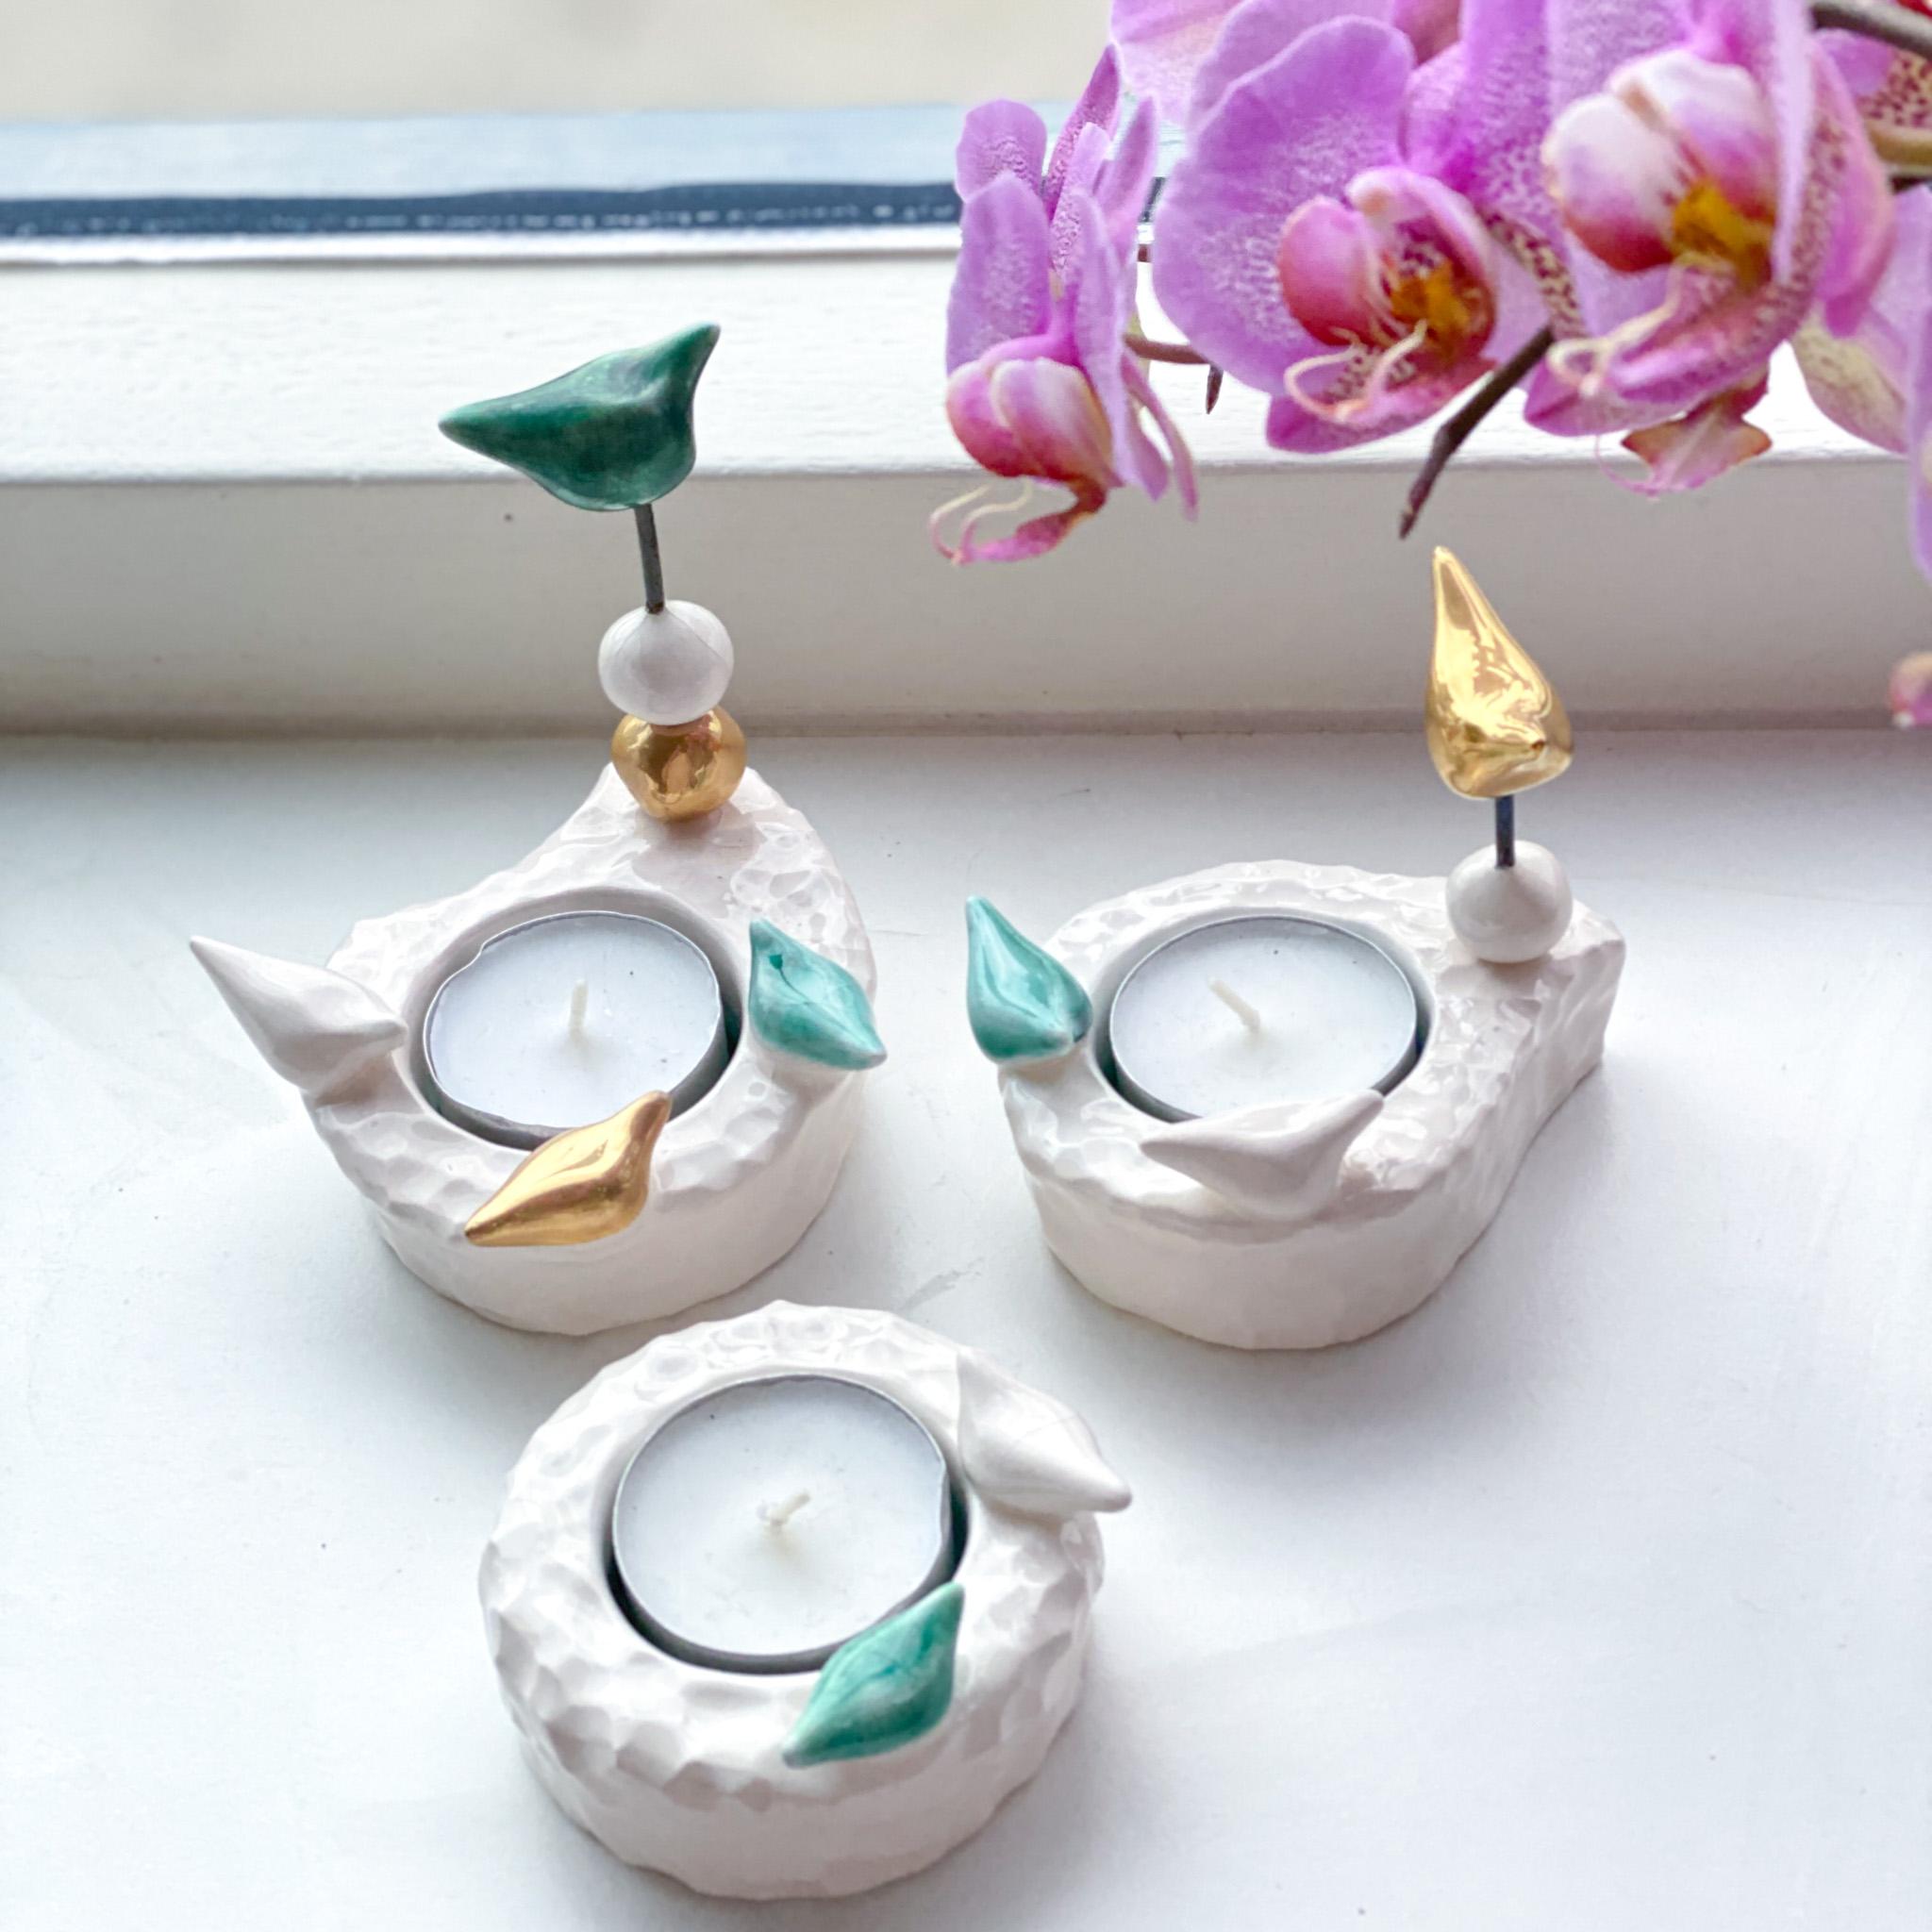 Farnegar handmade candelabras Green( available in 3 sizes)